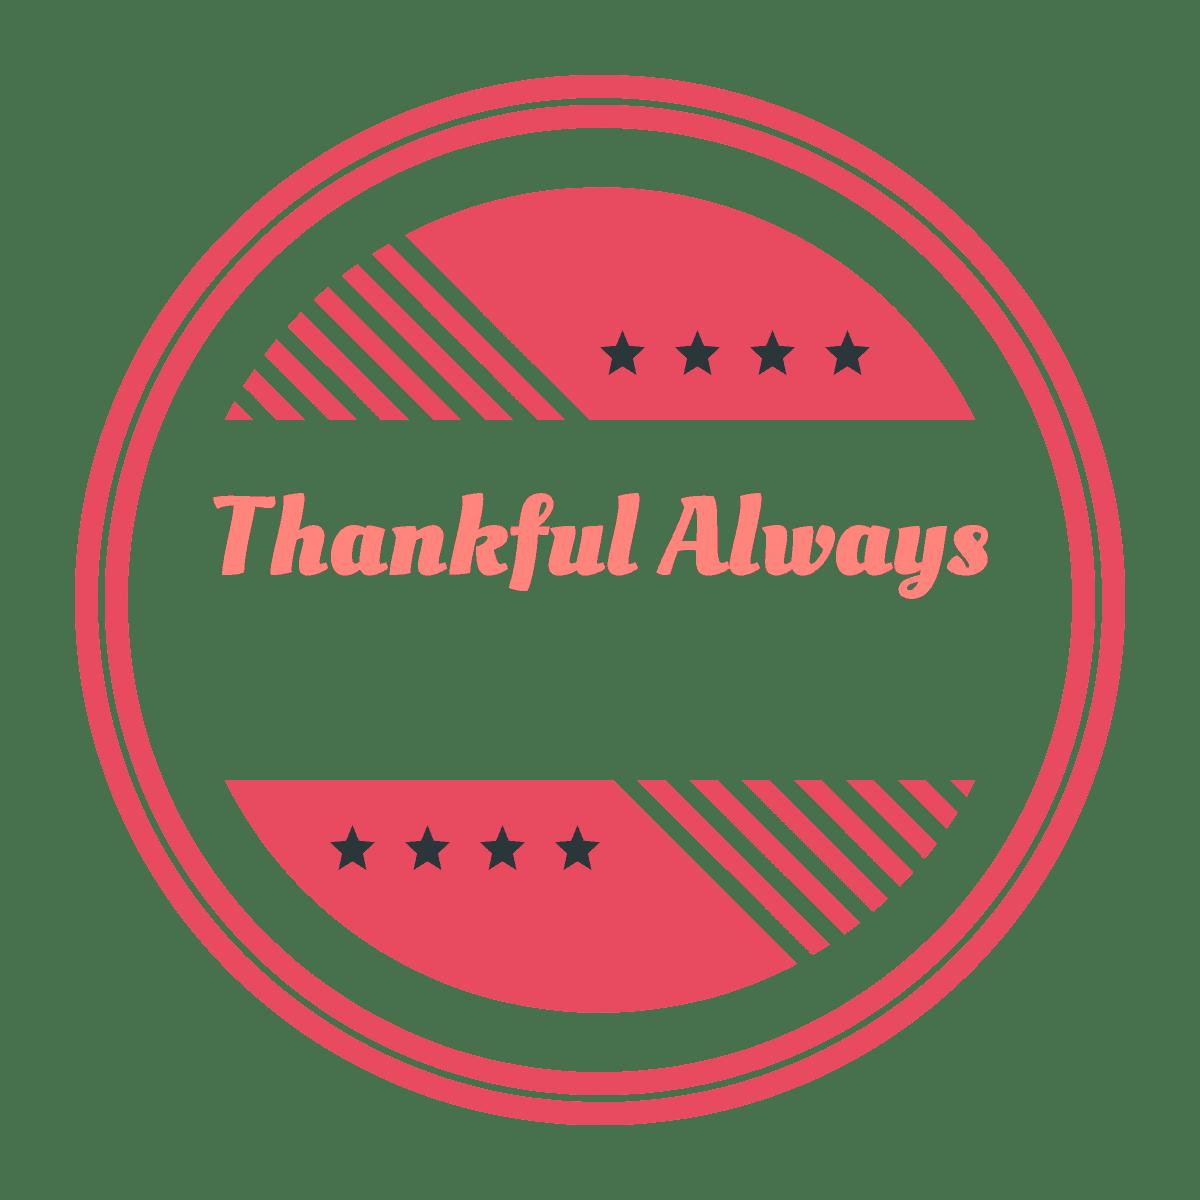 Thankful Always Footer